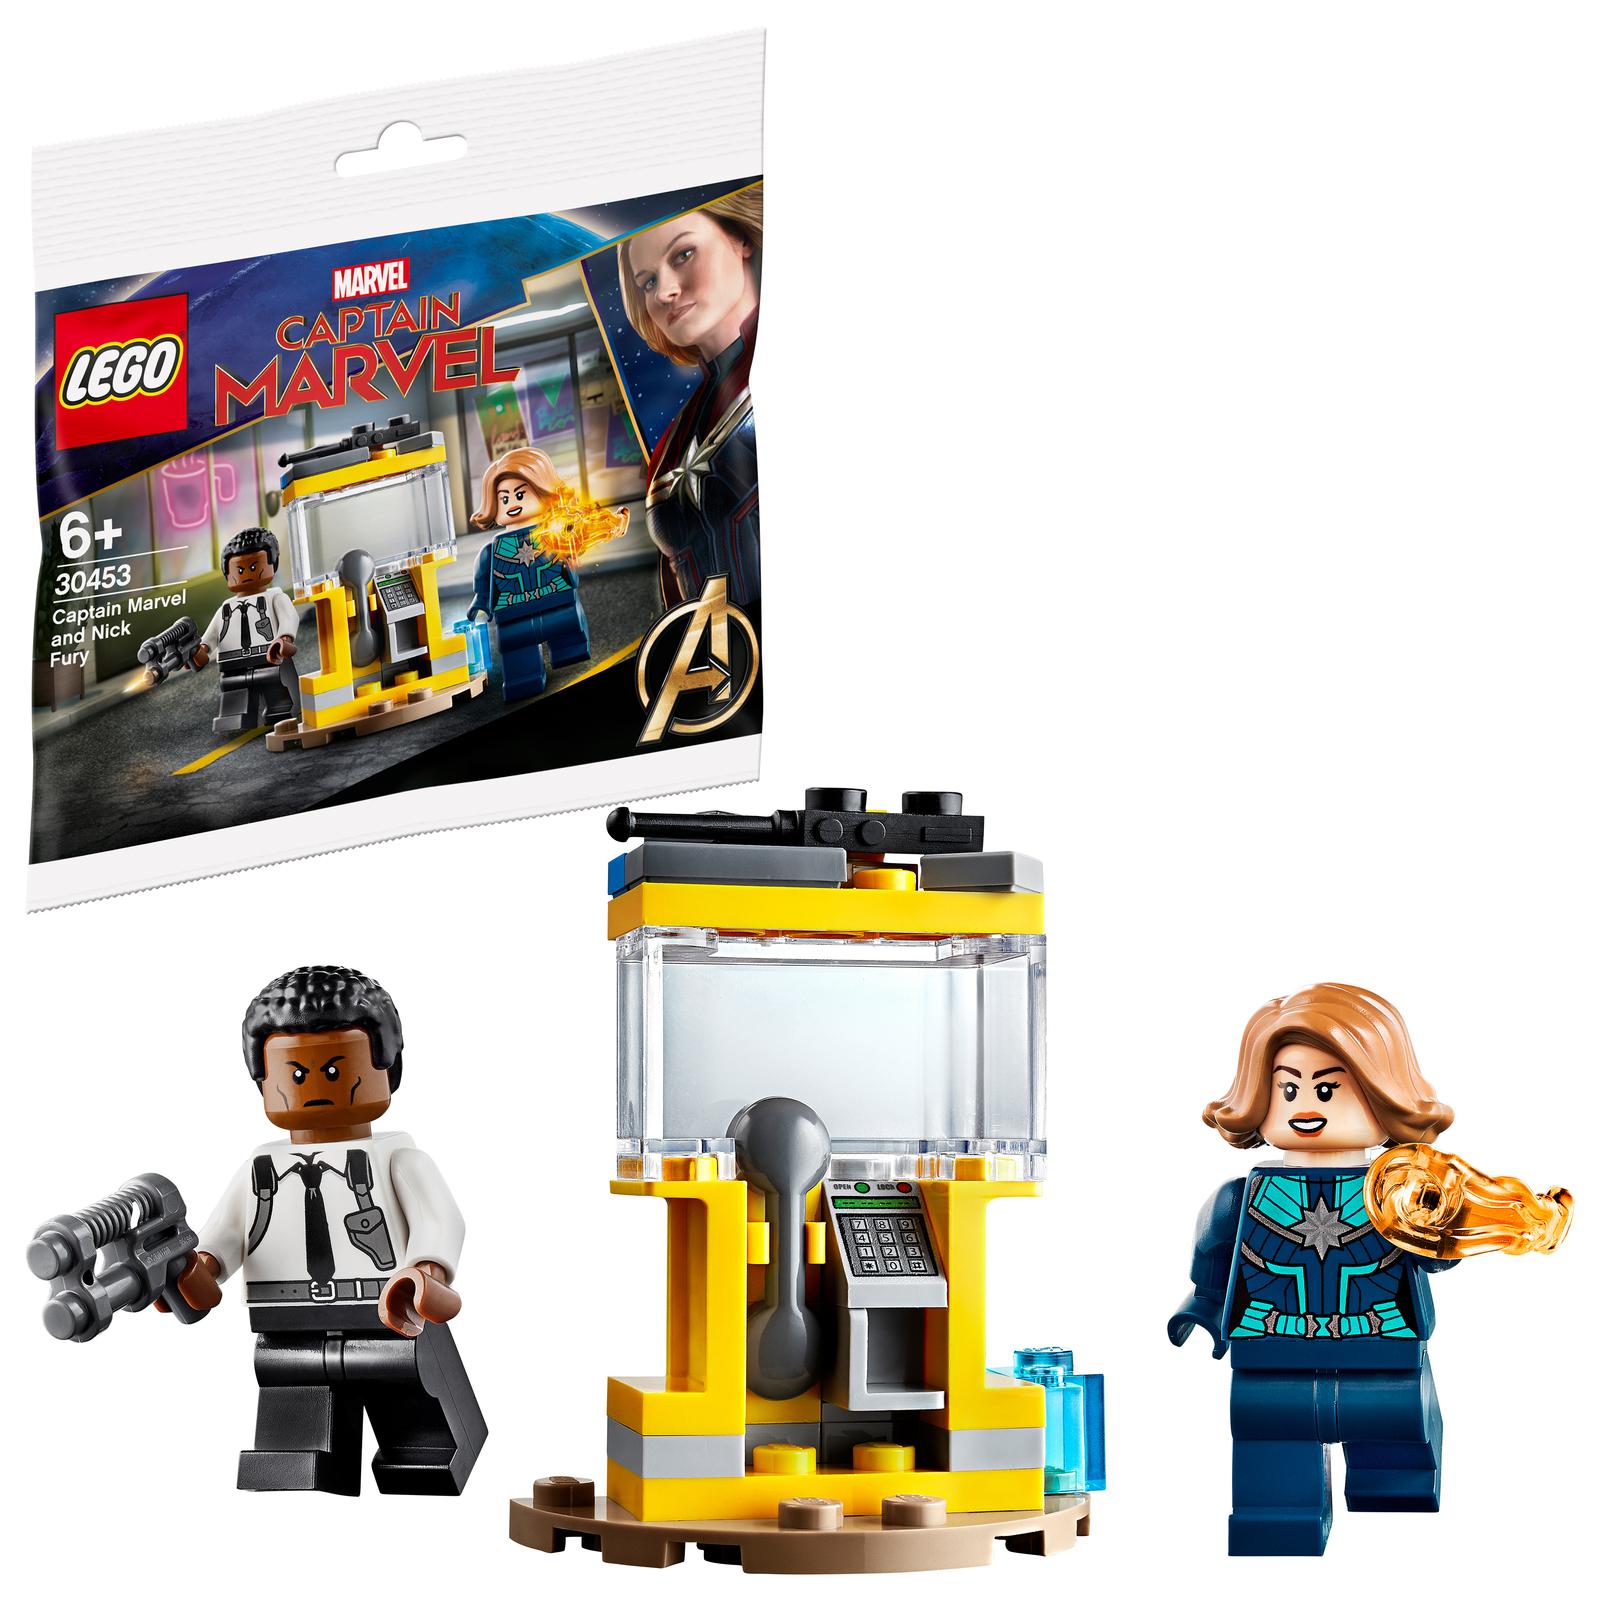 Lego: Captain Marvel and Nick Fury image